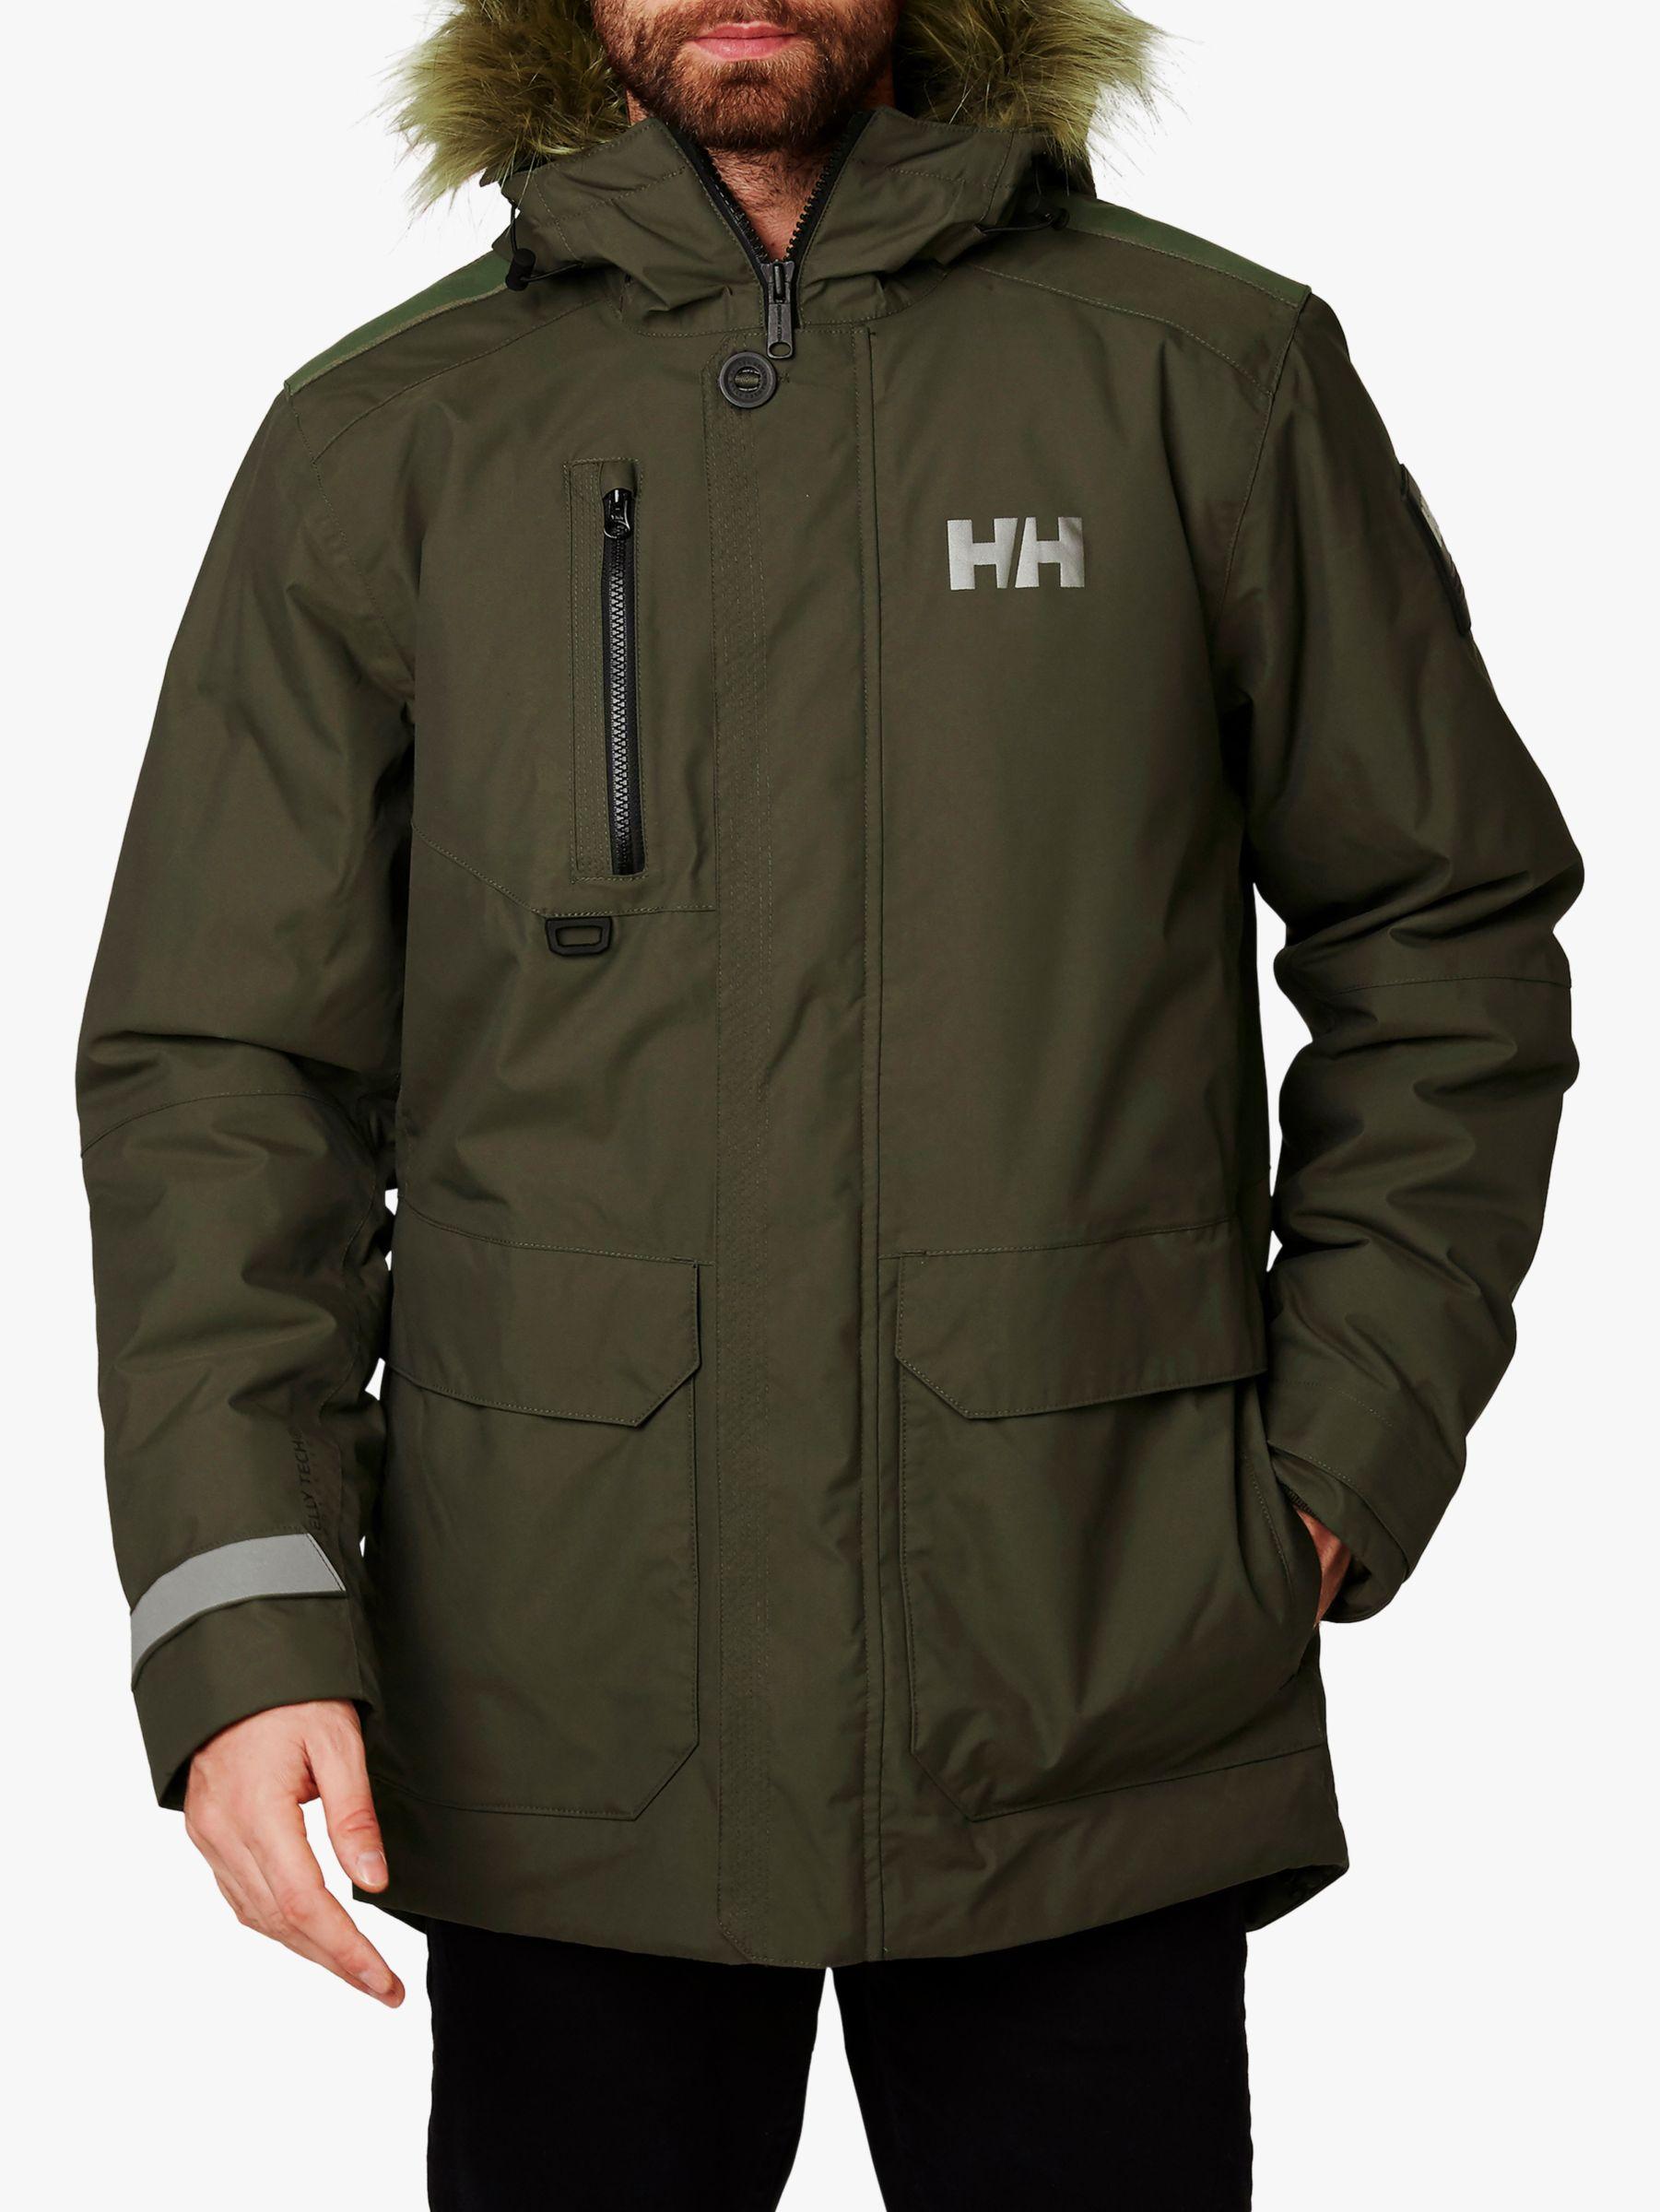 Helly Hansen Helly Hansen Svalbard Men's Waterproof Parka Jacket, Beluga